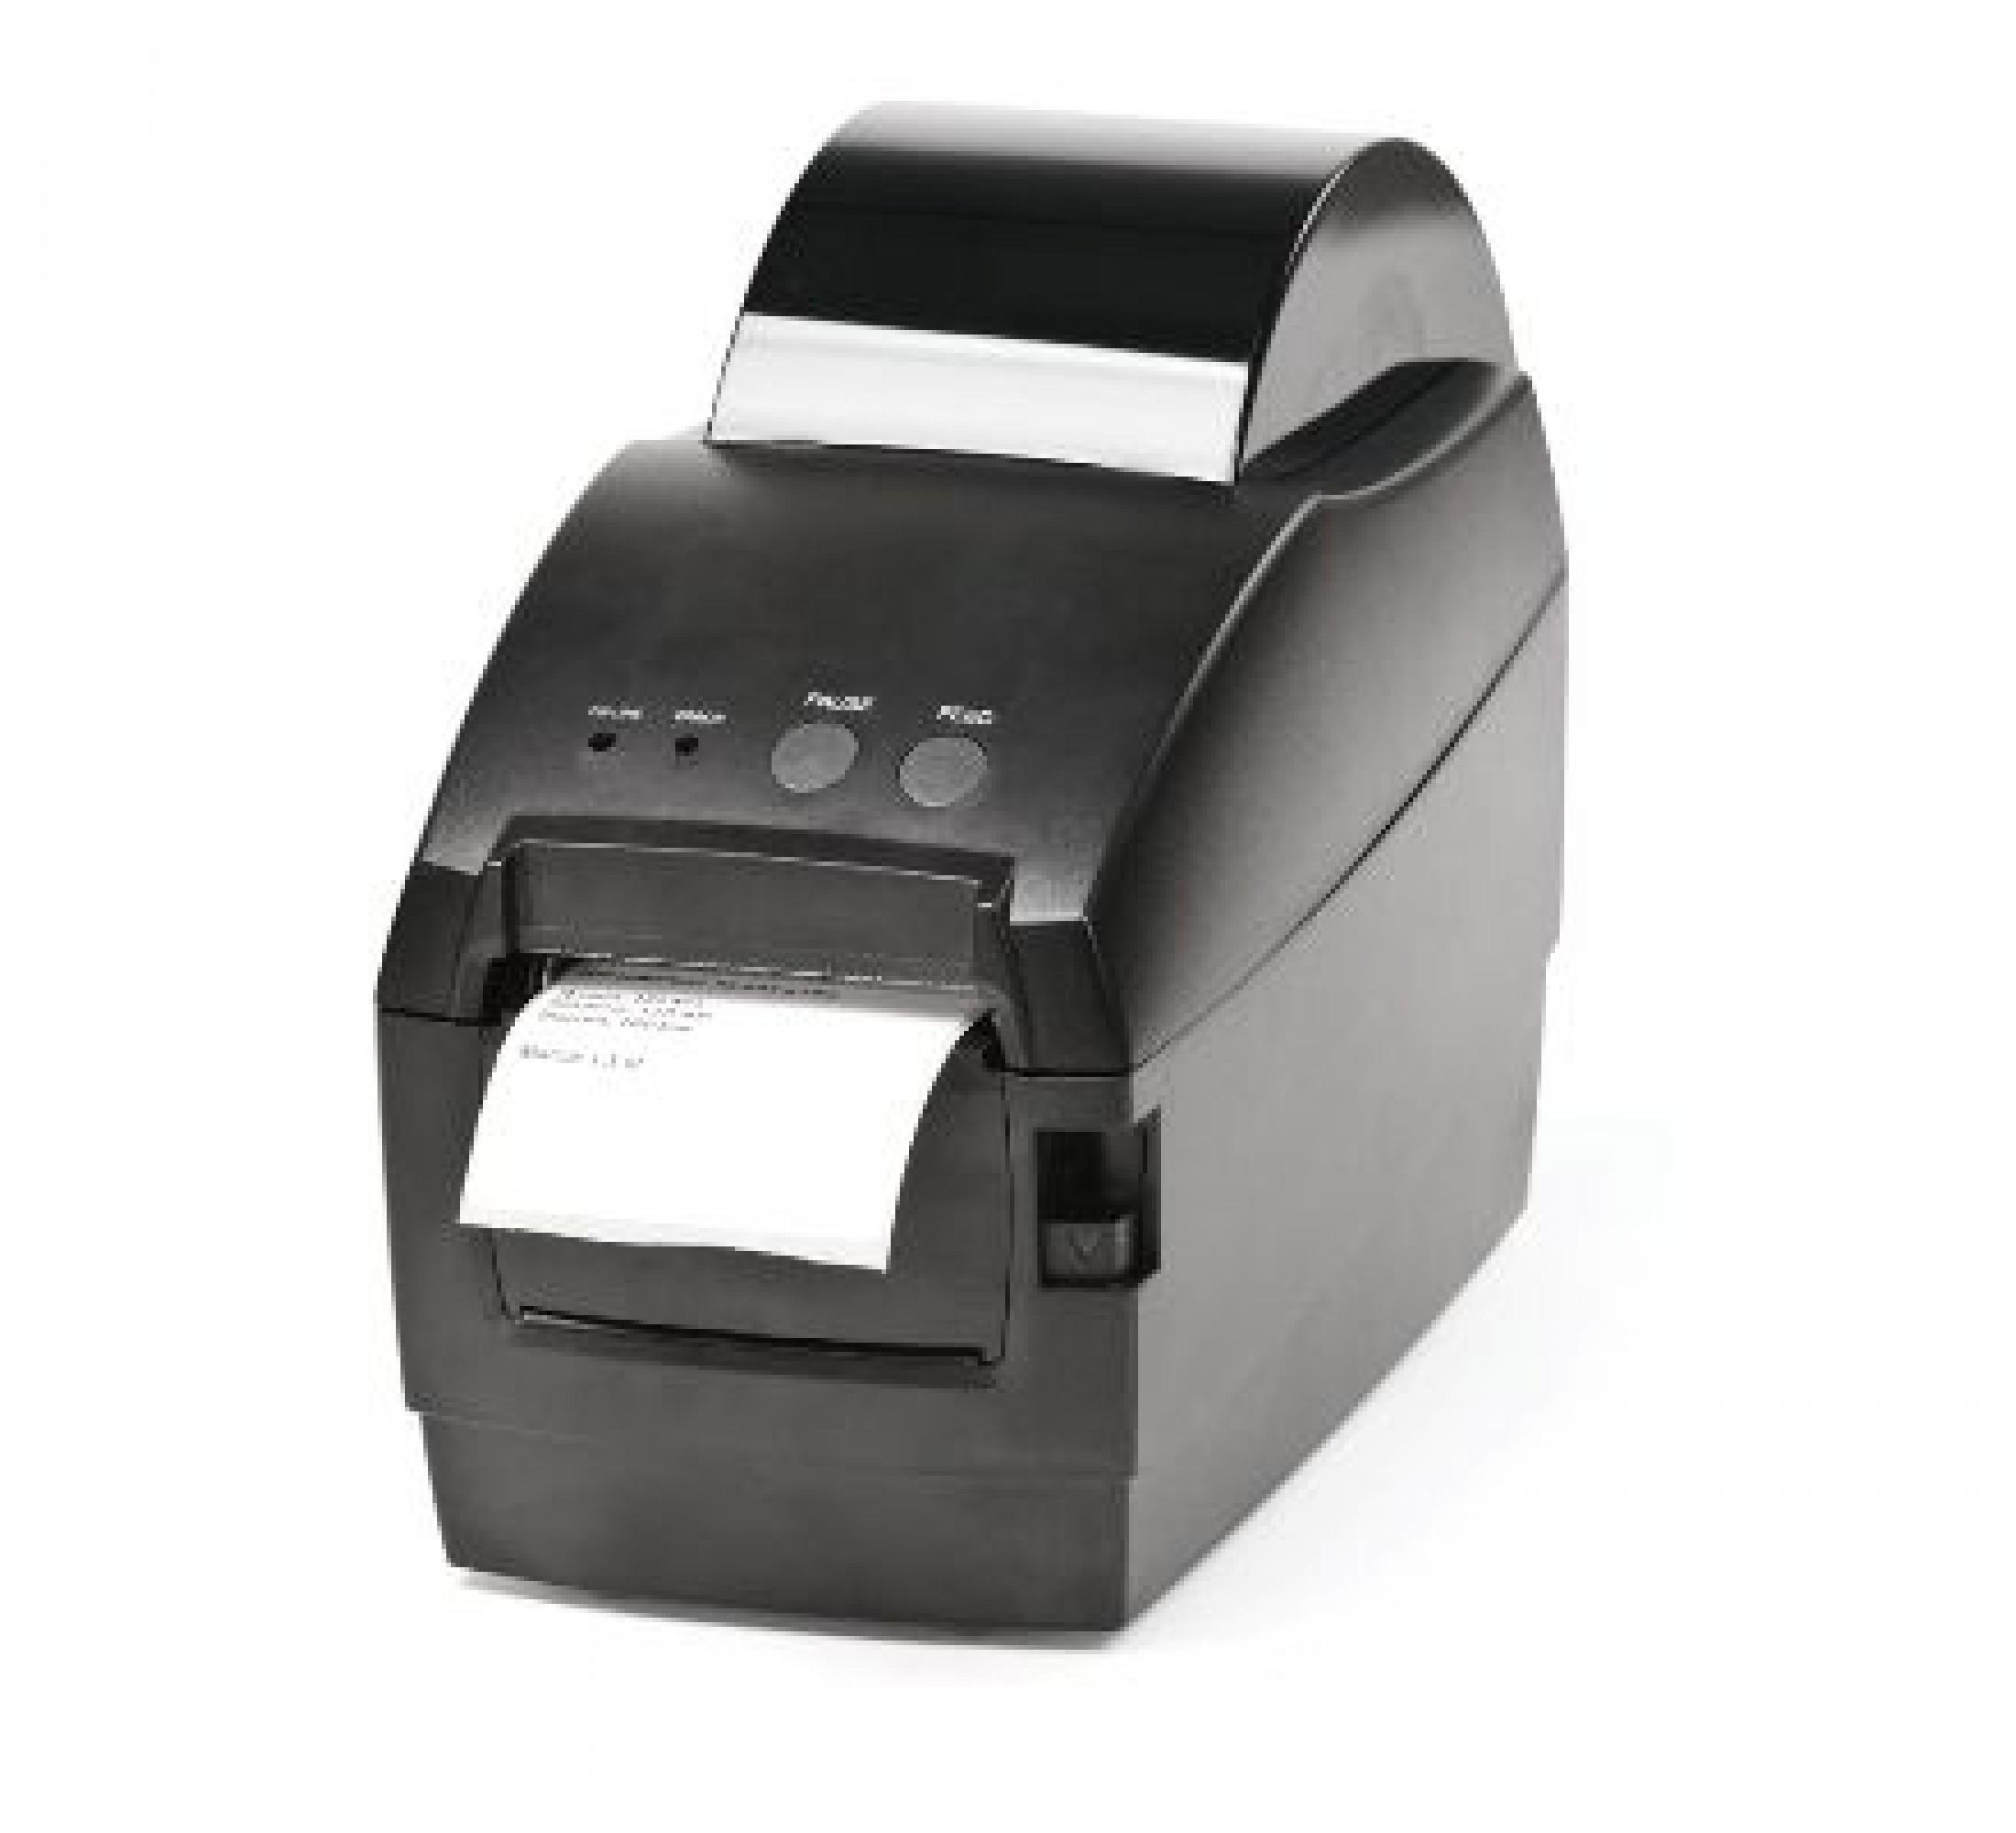 Принтер этикеток АТОЛ BP21 (203dpi, термопечать, RS-232 x USB, ширина печати 54мм, скорость 127 мм/с)